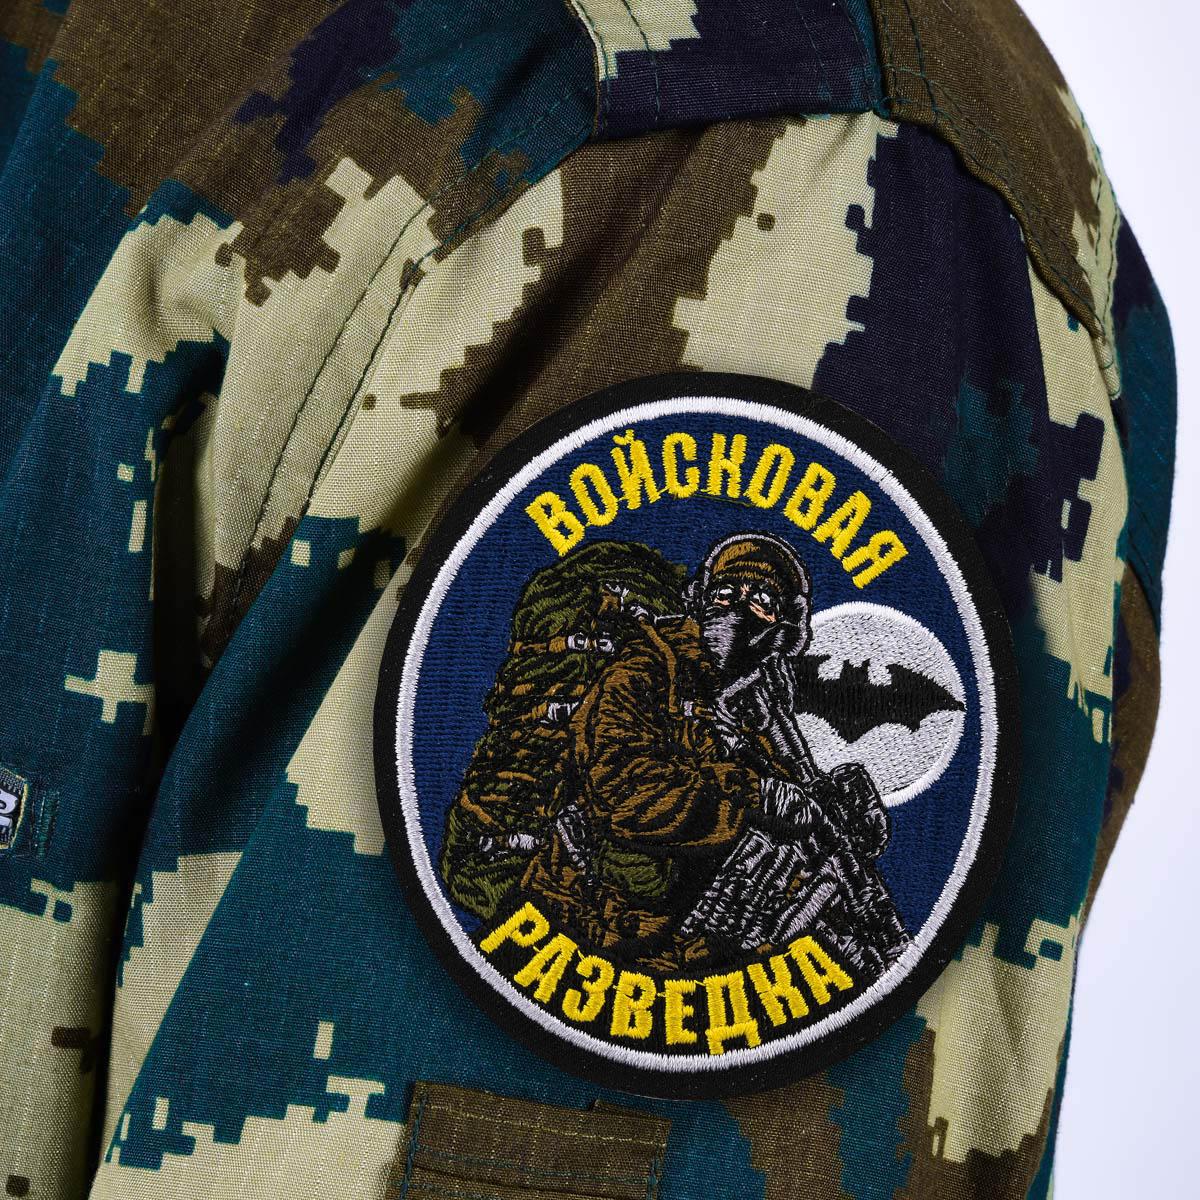 Шеврон разведки - купить в Военпро